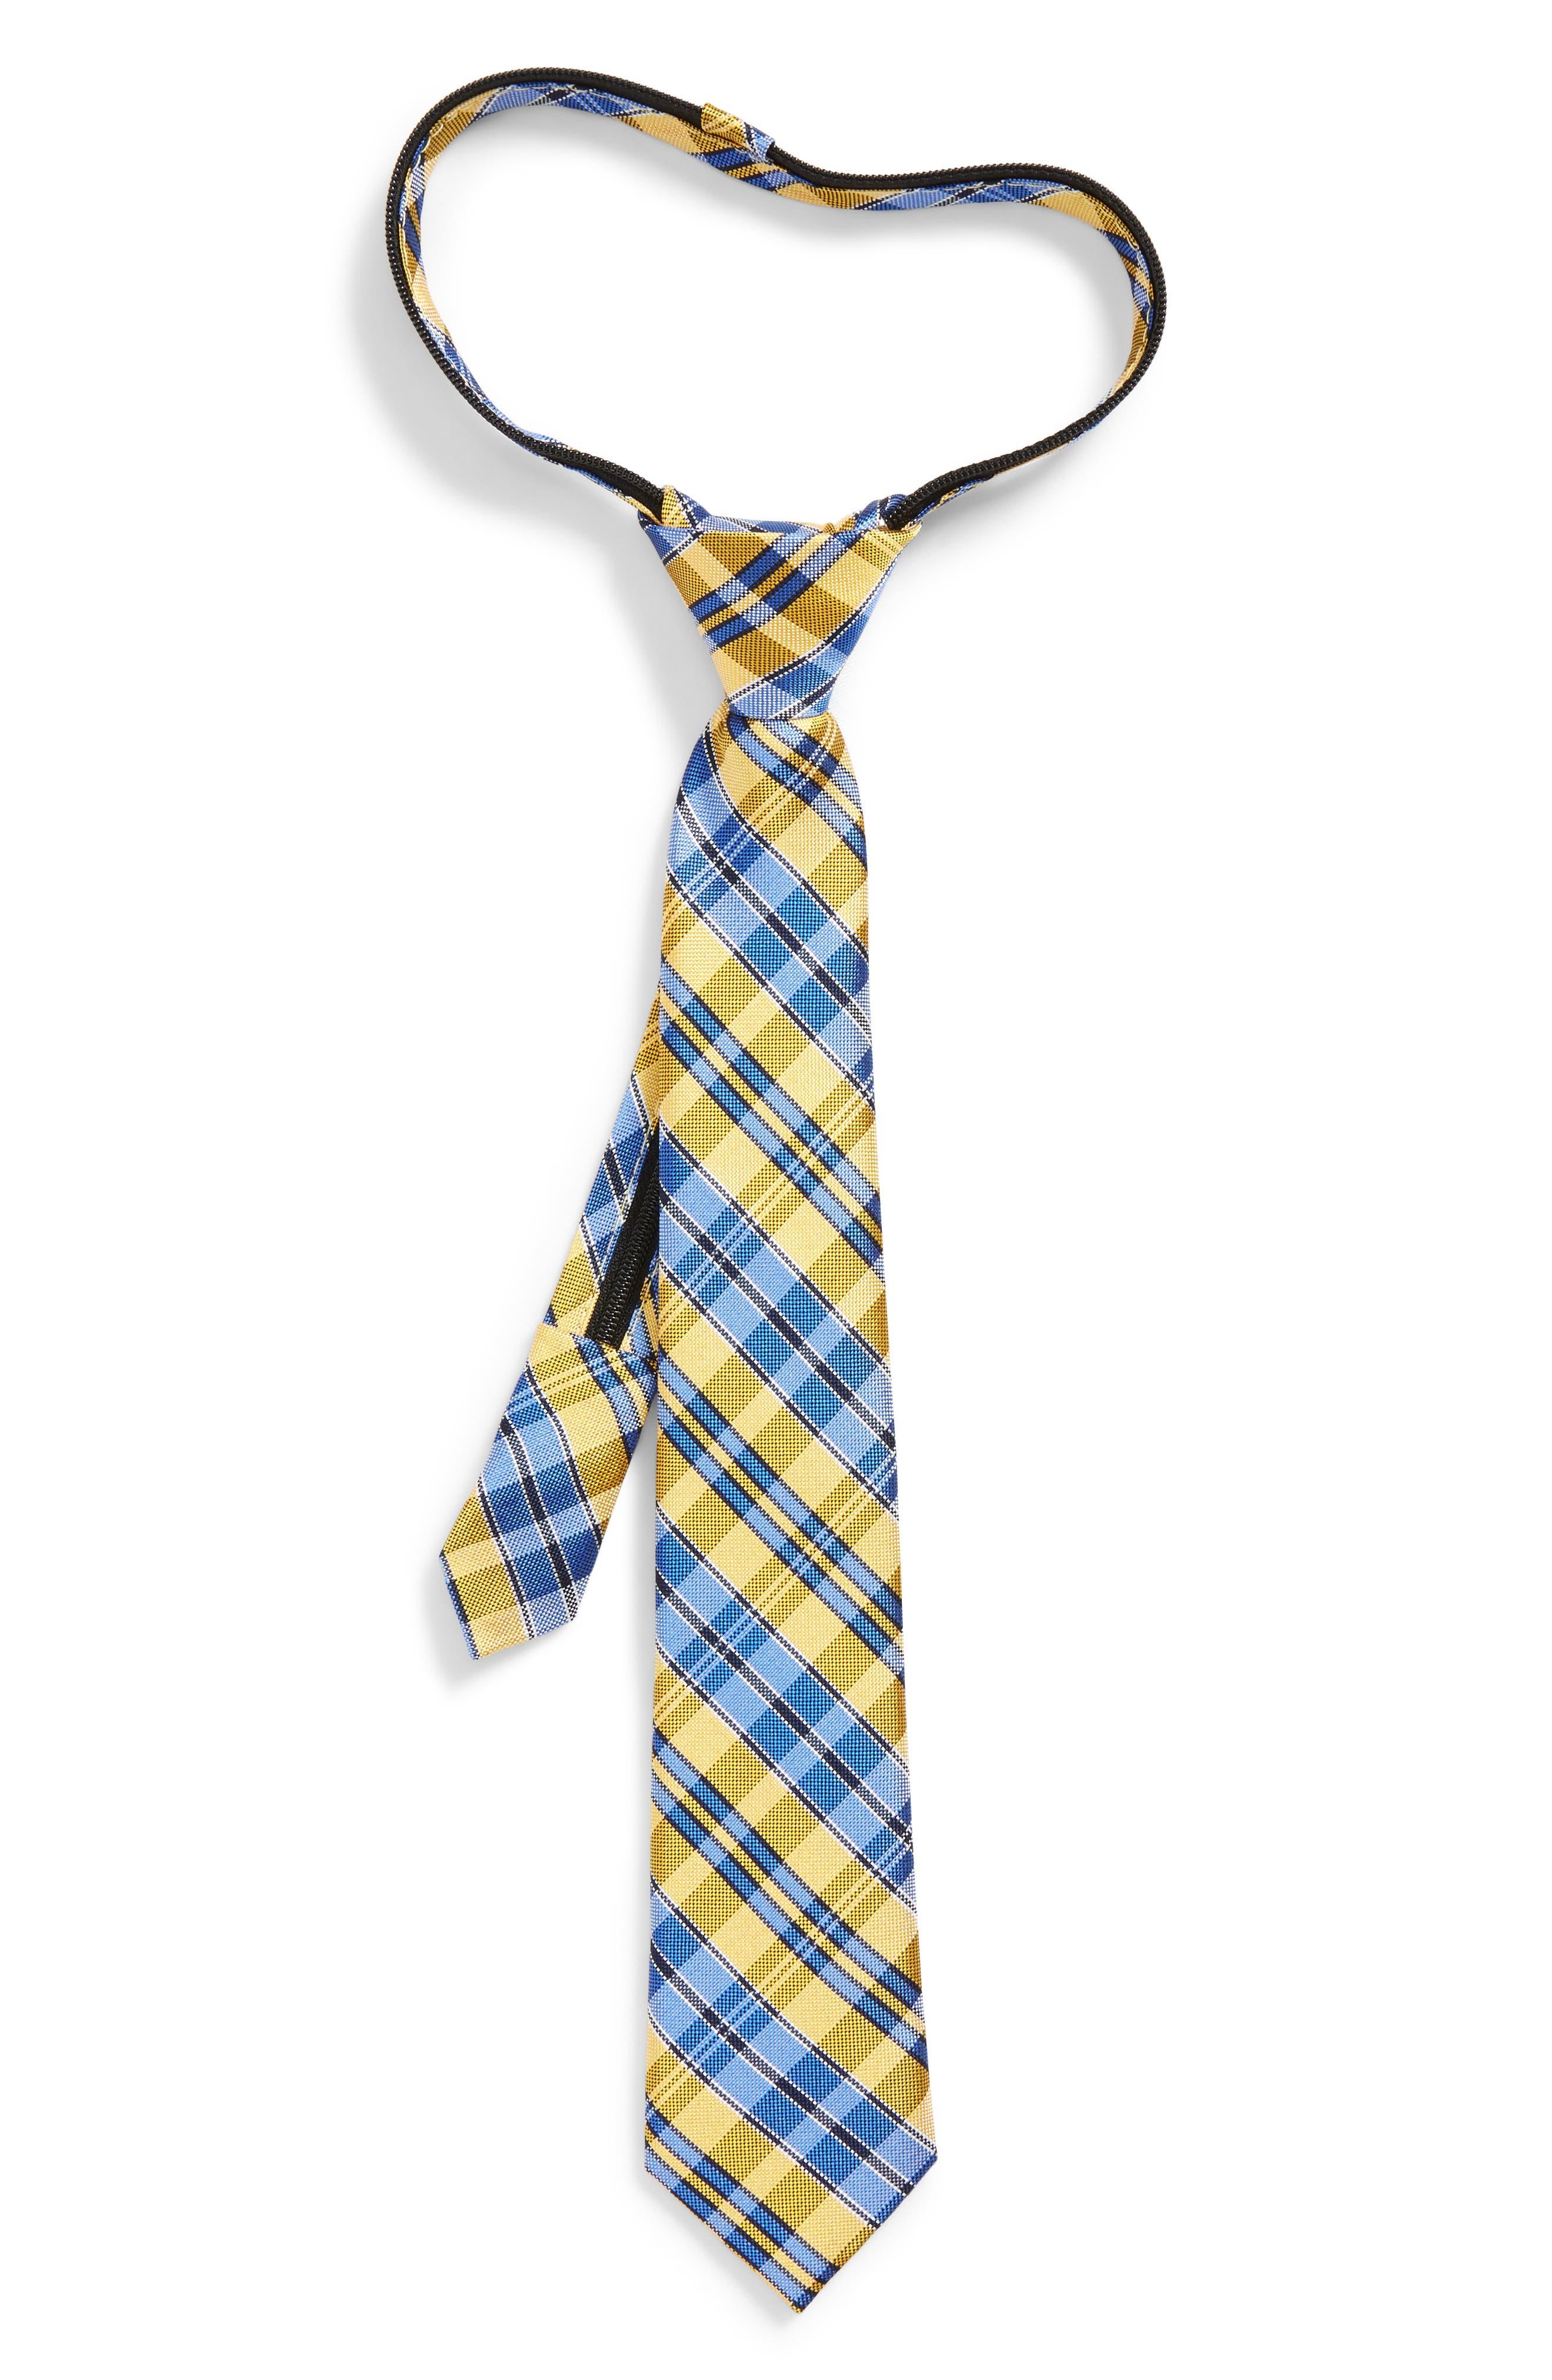 Plaid Silk Zip Tie,                             Main thumbnail 1, color,                             Gold